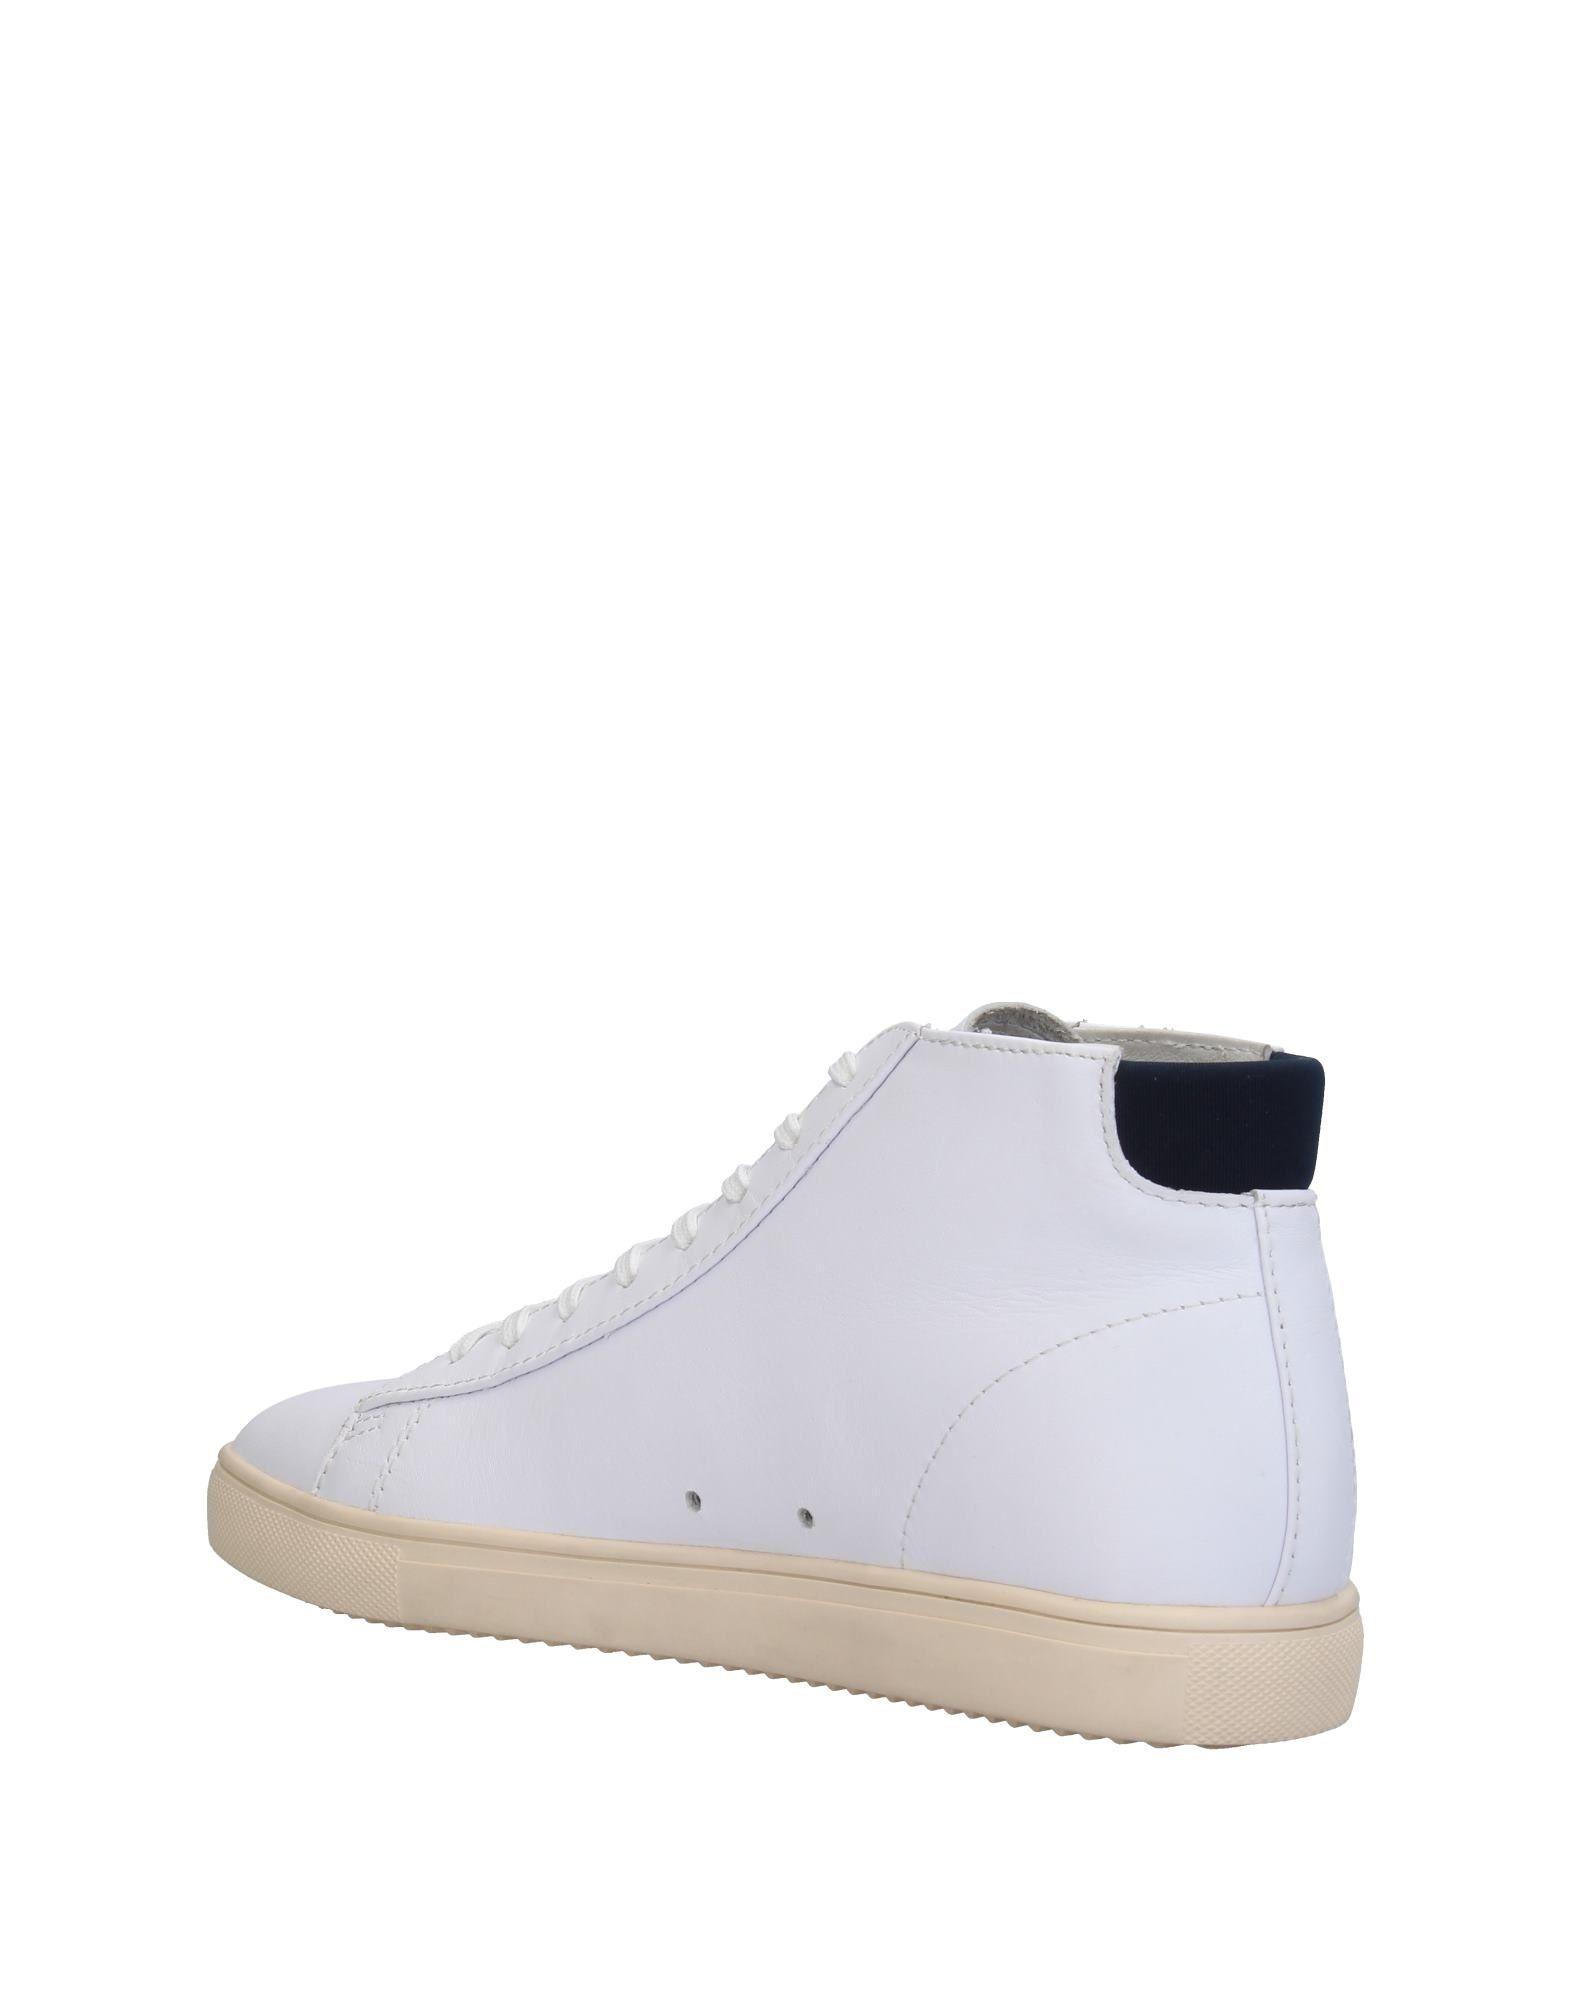 Rabatt echte  Schuhe Clae Sneakers Herren  echte 11392522BI 3b44fc